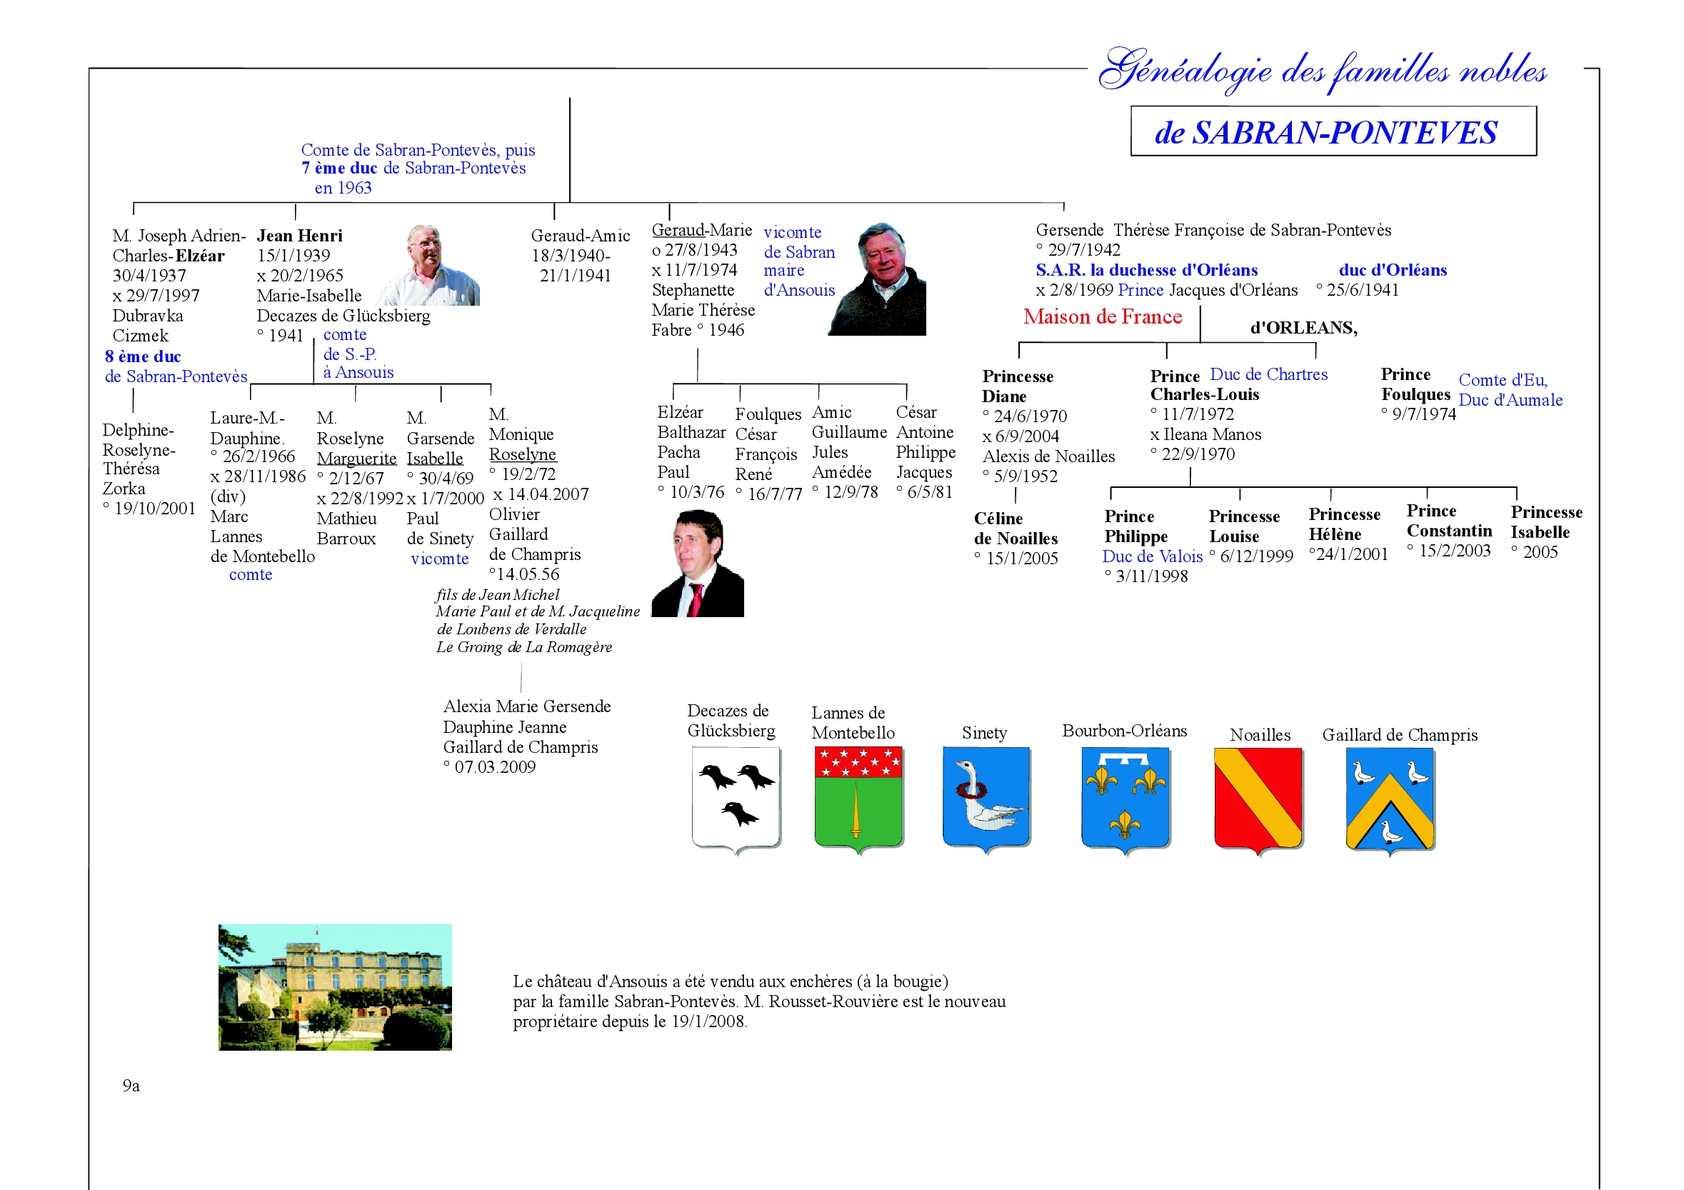 Genealogie Famille Sabran Calameo Downloader